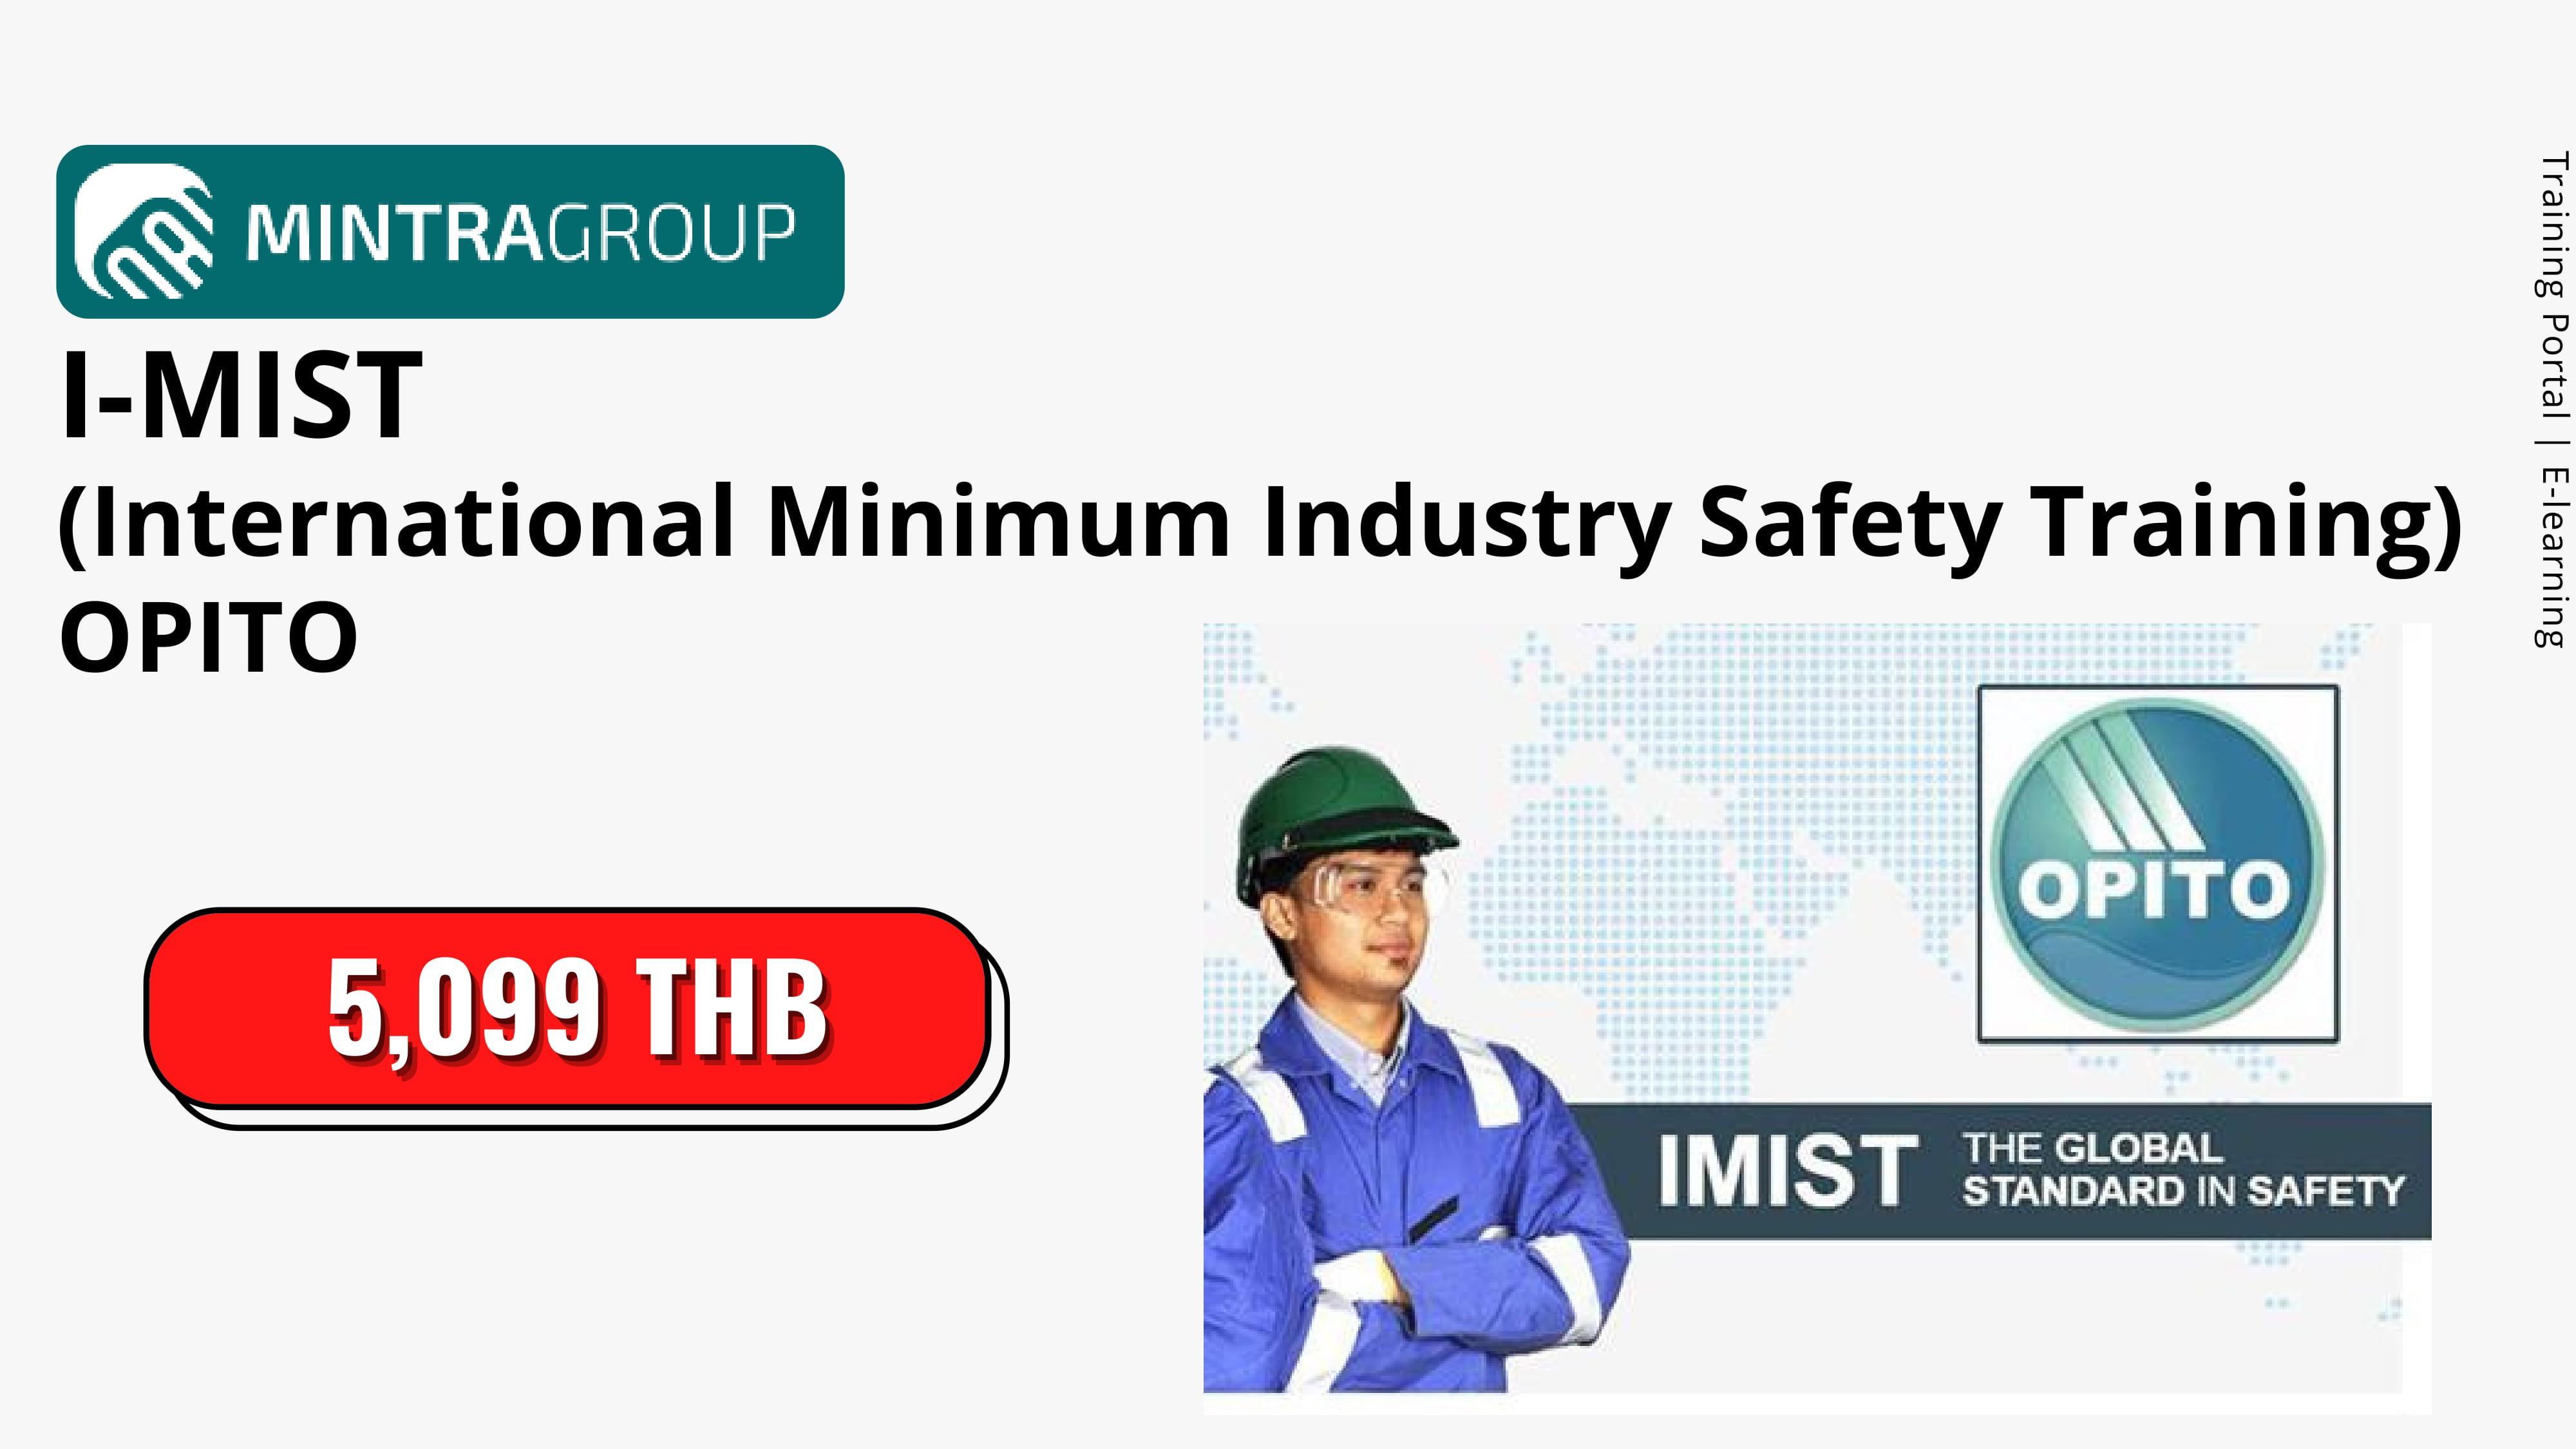 I-MIST (International Minimum Industry Training) OPITO